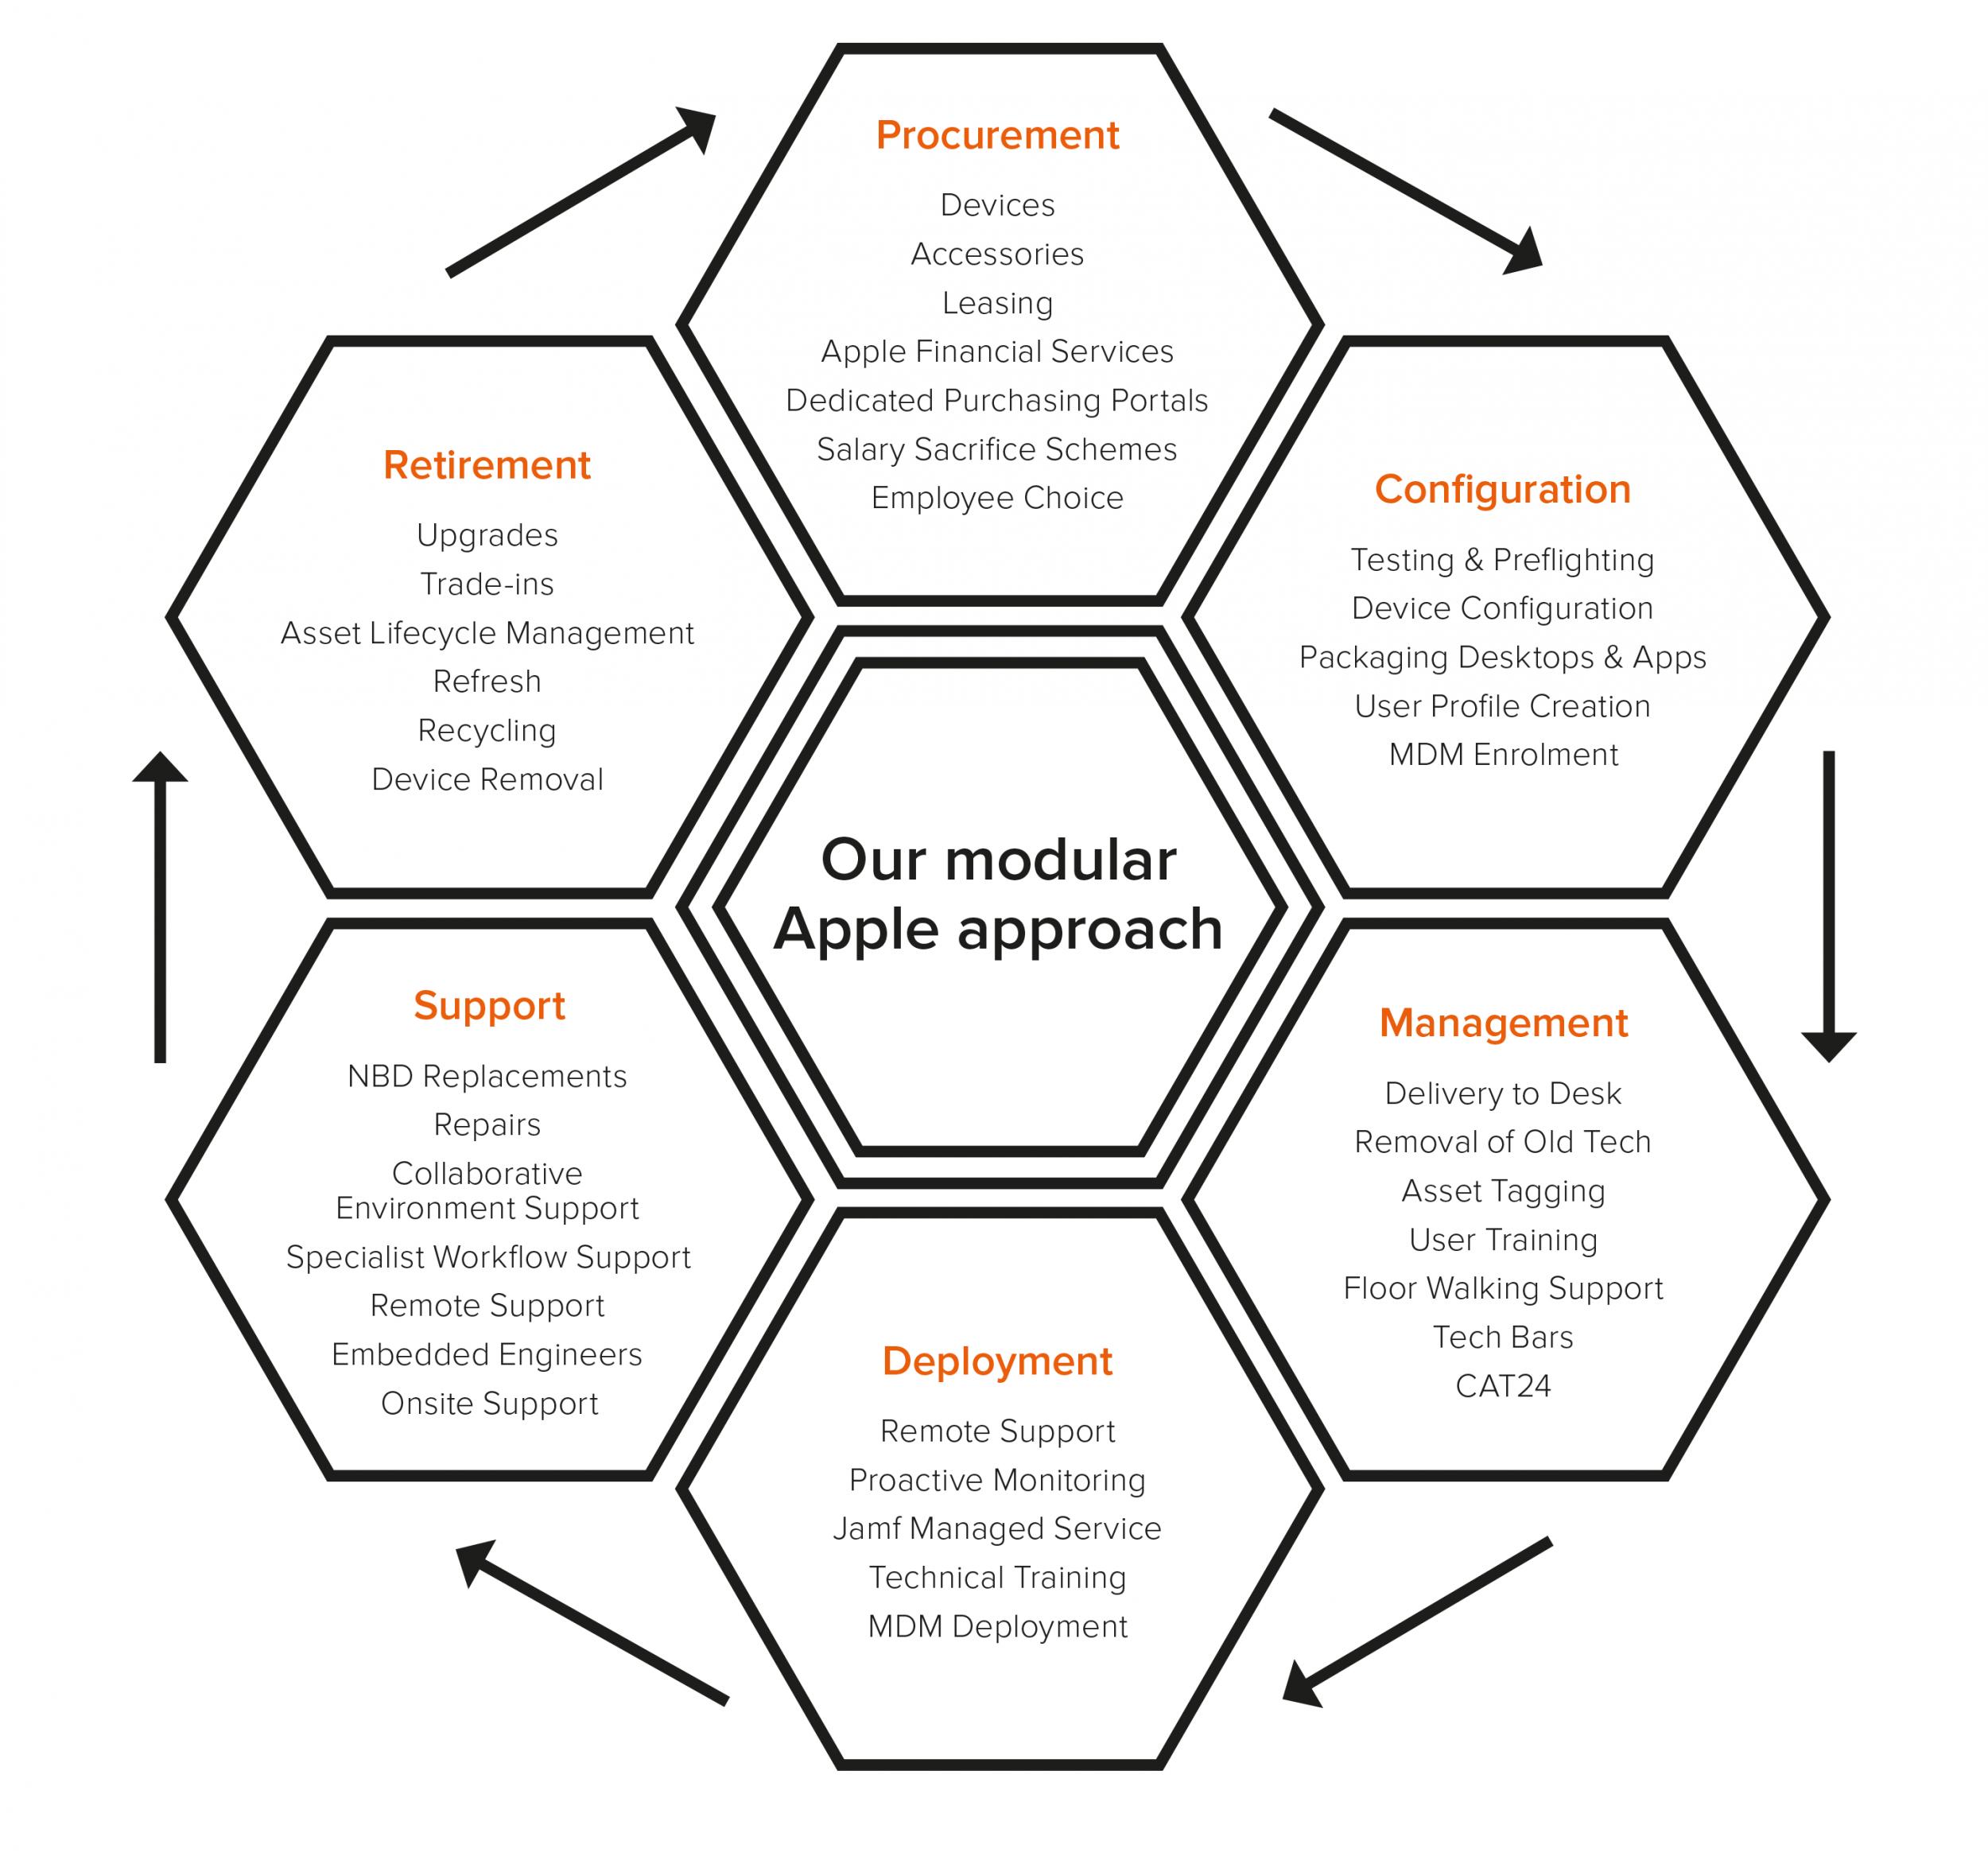 Illustration of a modular Apple approach